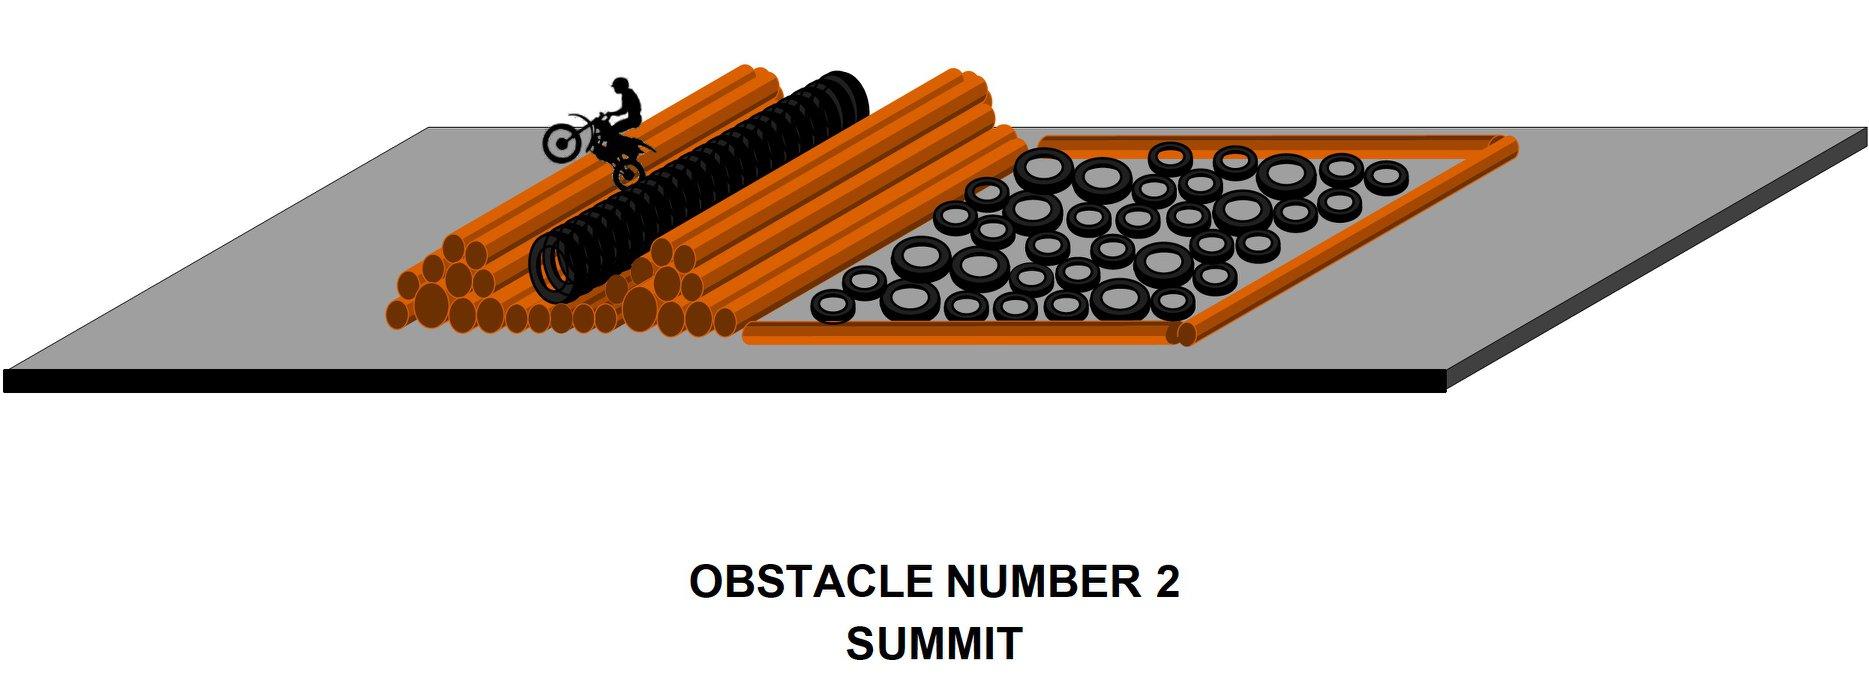 enduro obstacle.jpg